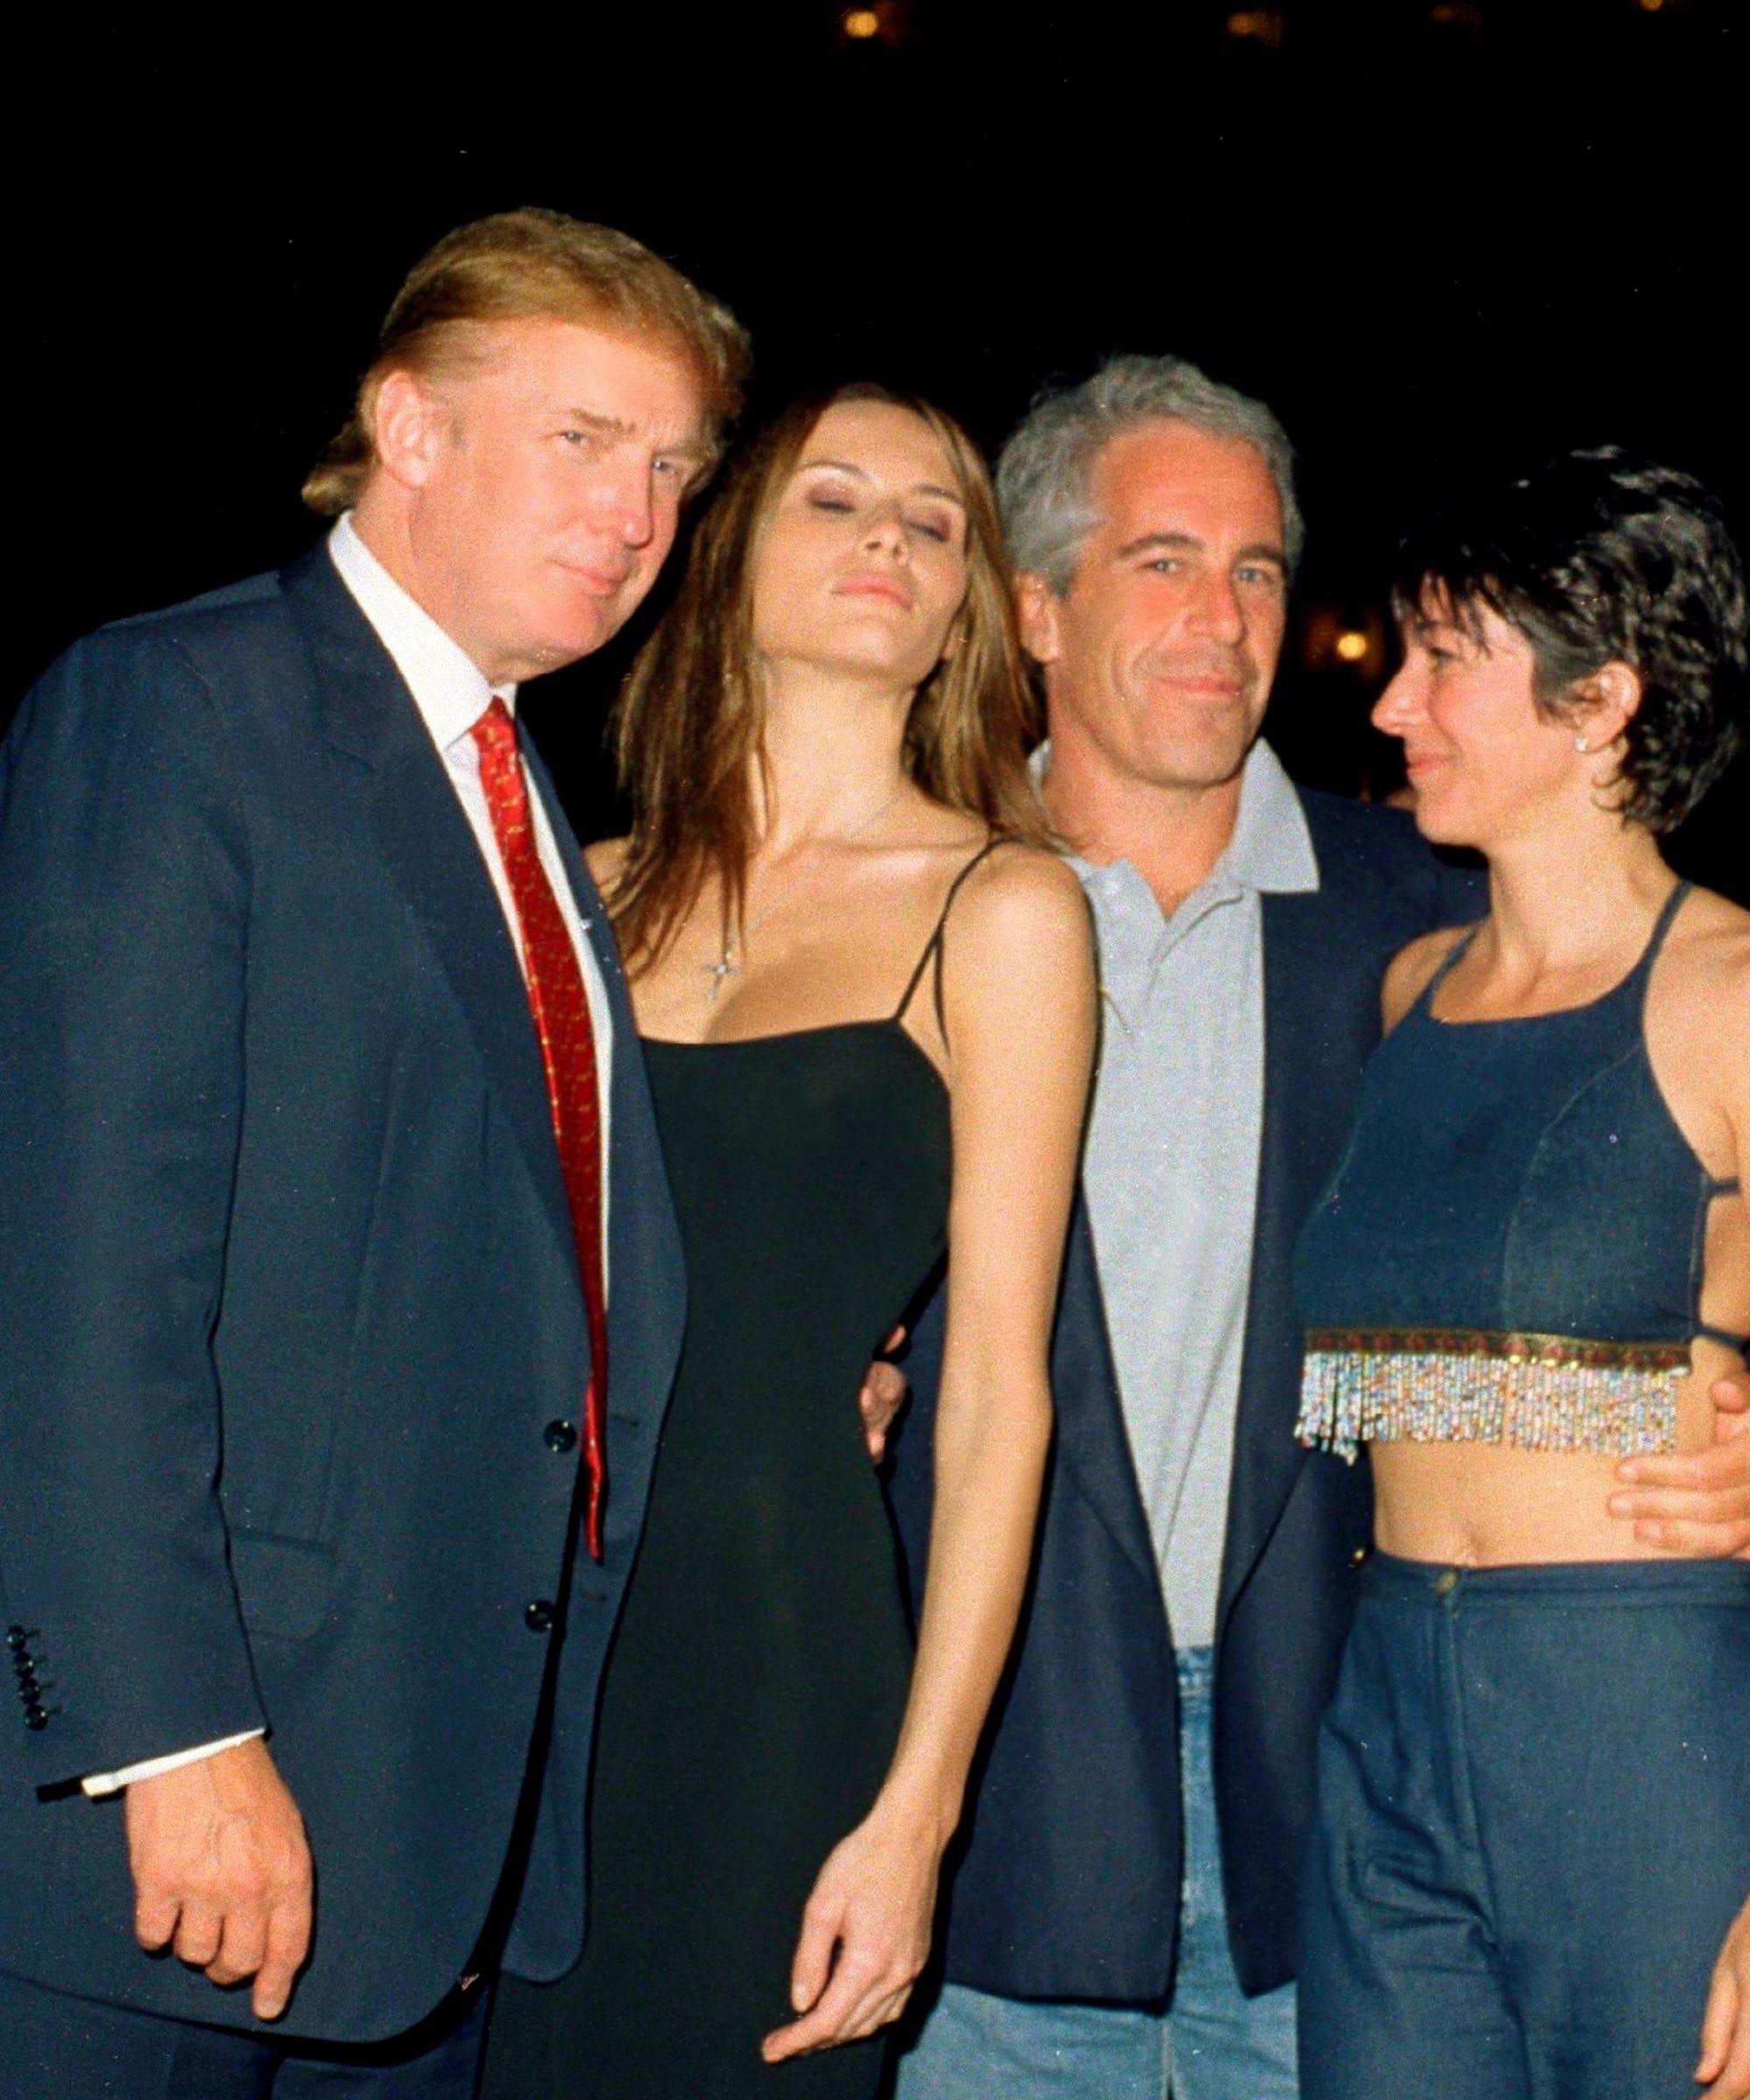 From Clinton To Trump: The Powerful Men In Jeffrey Epstein's Orbit